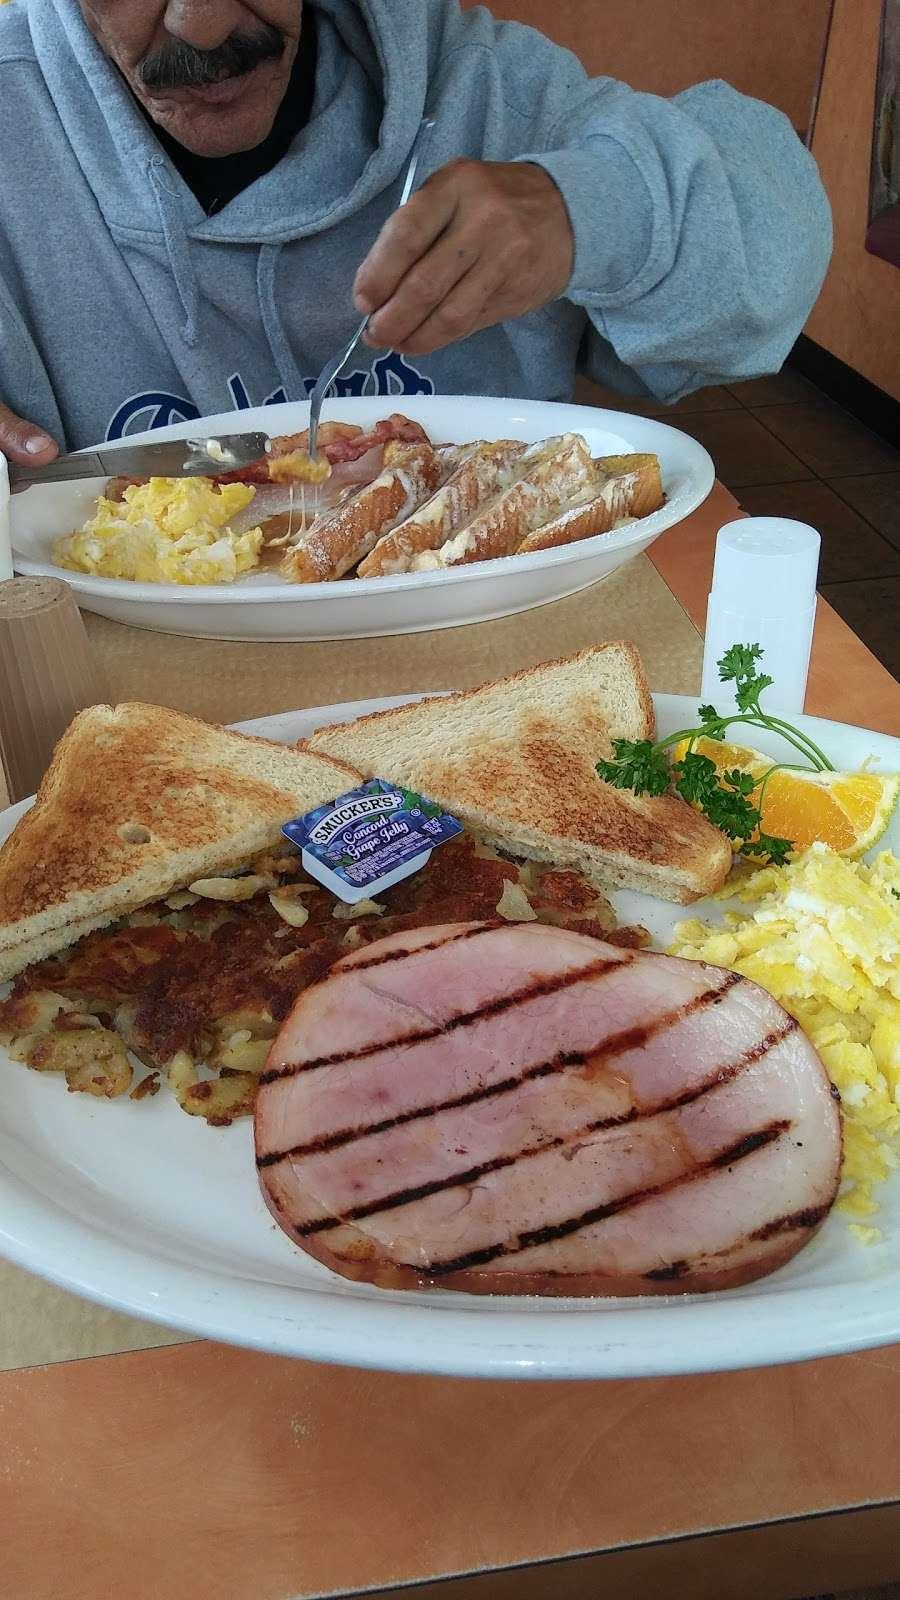 Flames Xpress - restaurant  | Photo 8 of 10 | Address: 11003 Lower Azusa Rd, El Monte, CA 91731, USA | Phone: (626) 350-7500